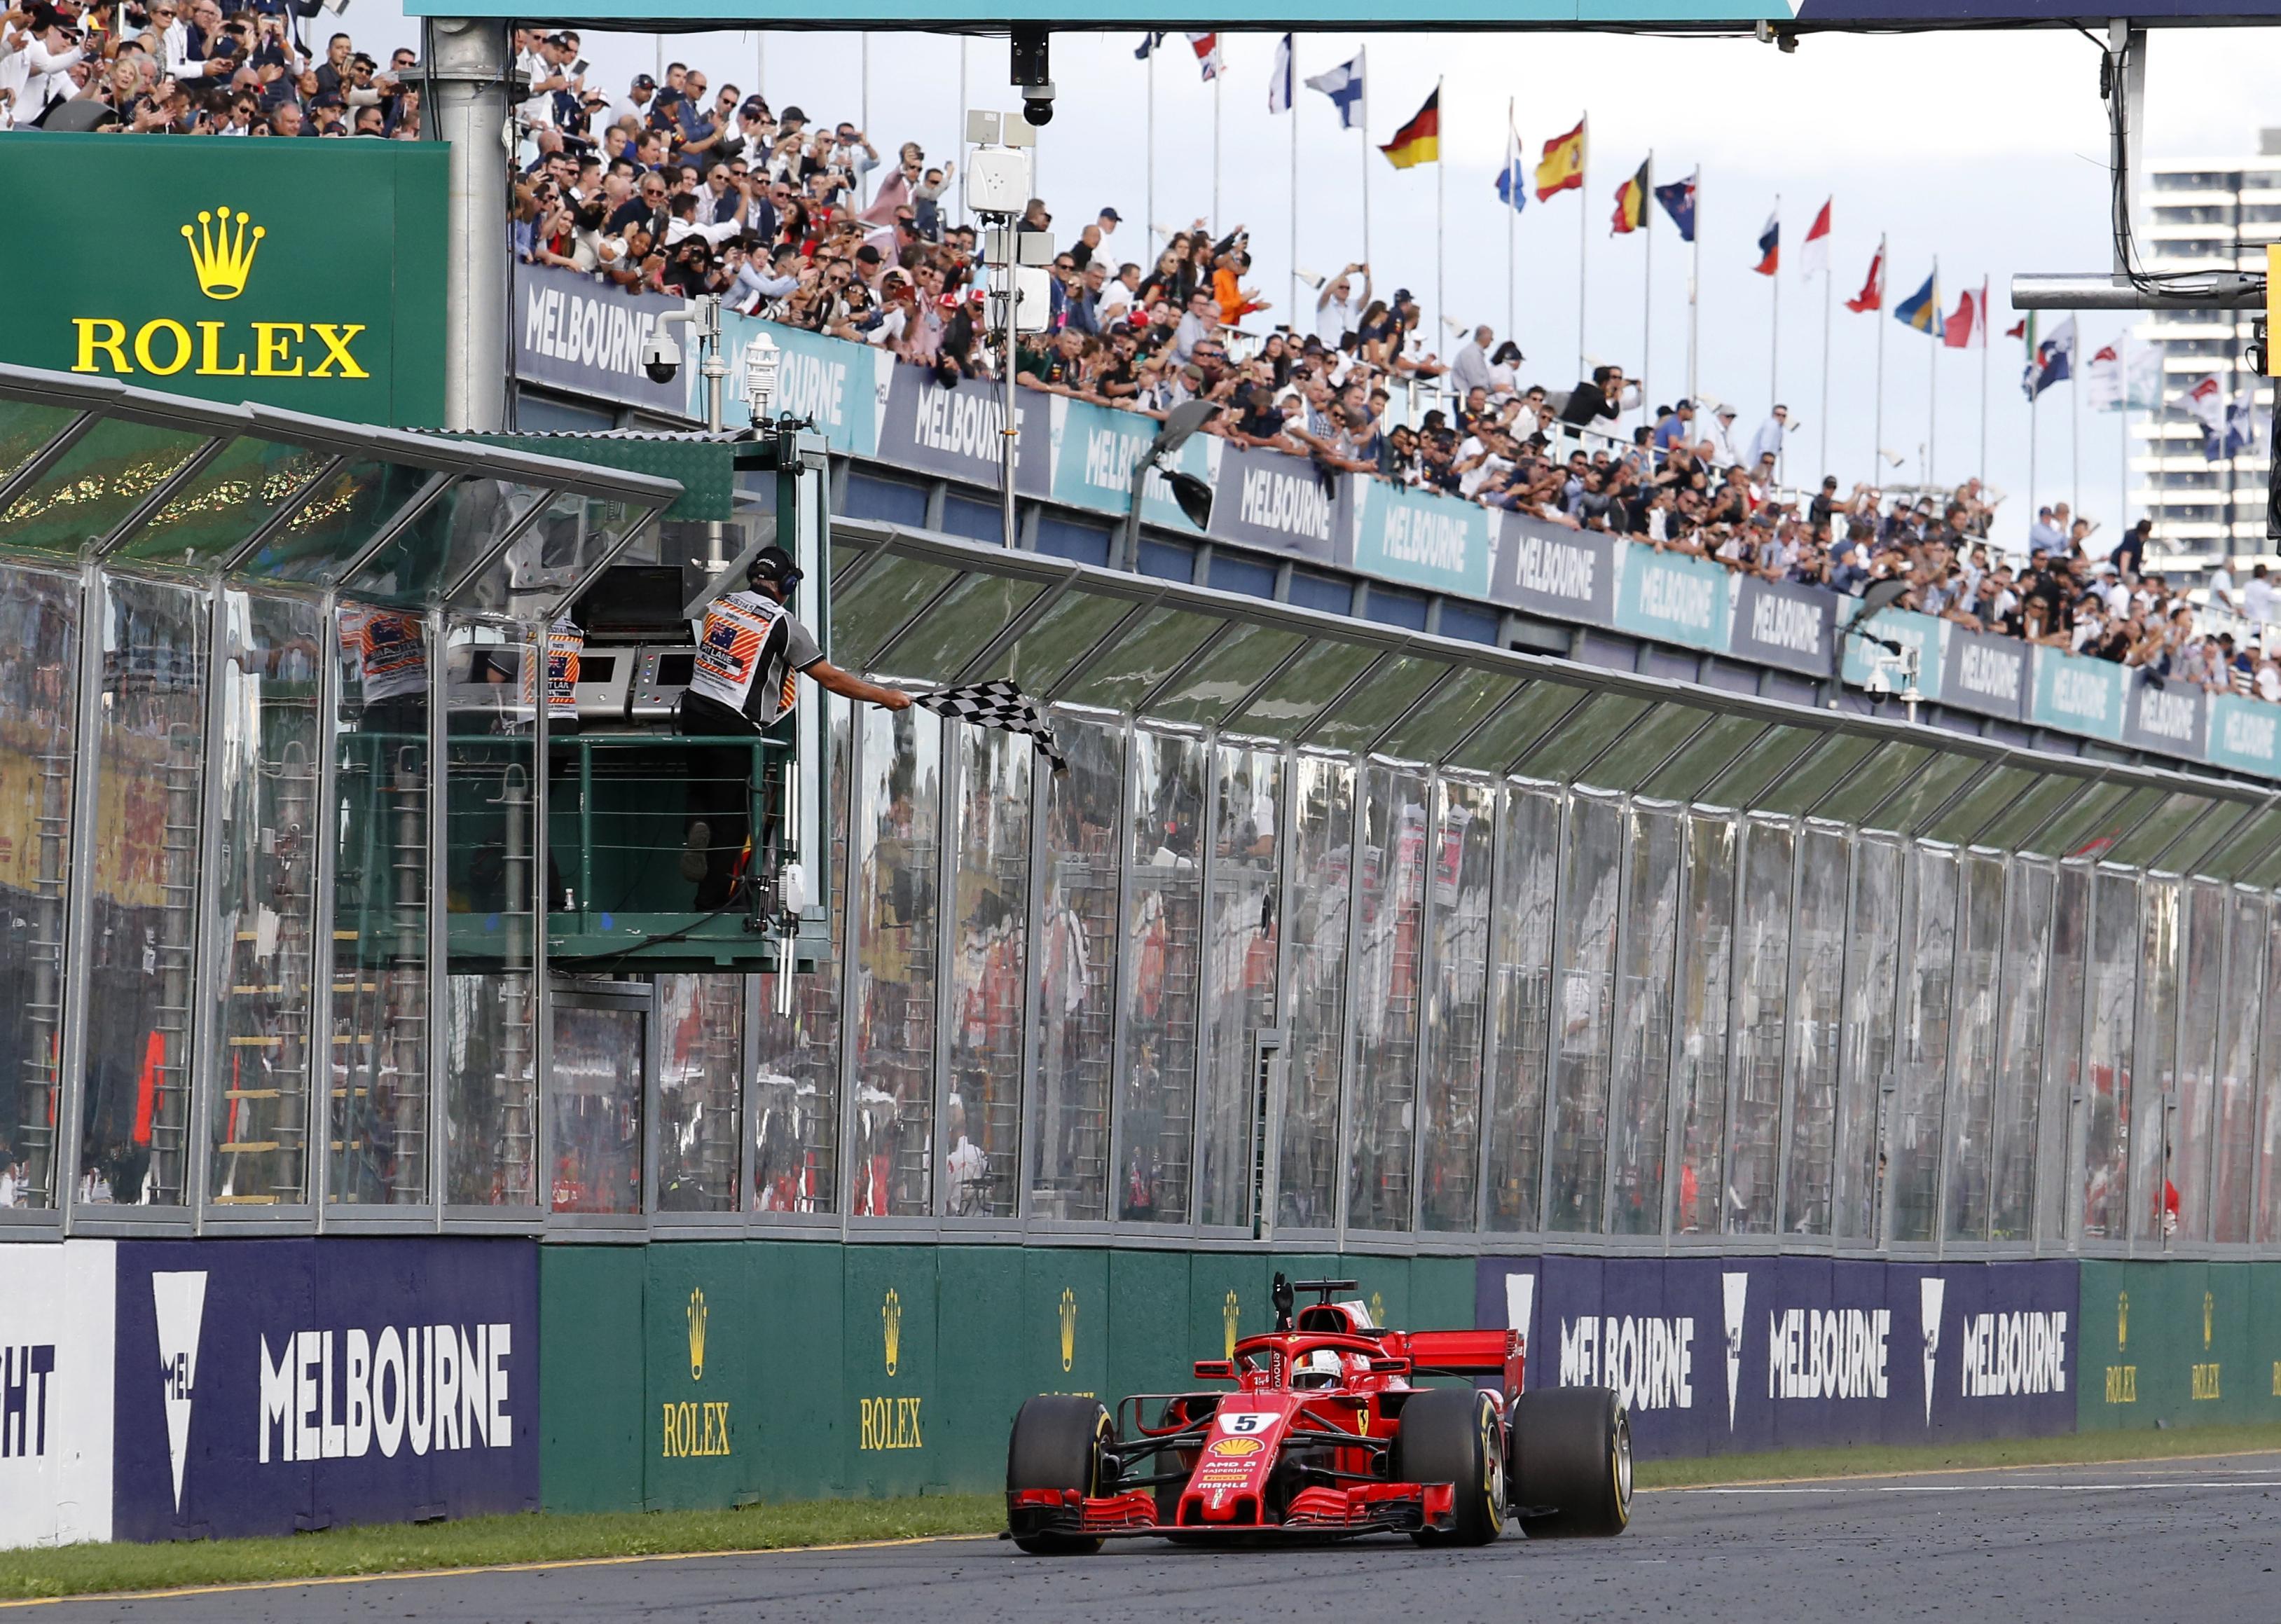 Sebastian Vettel took advantage of a virtual safety car to win in Melbourne